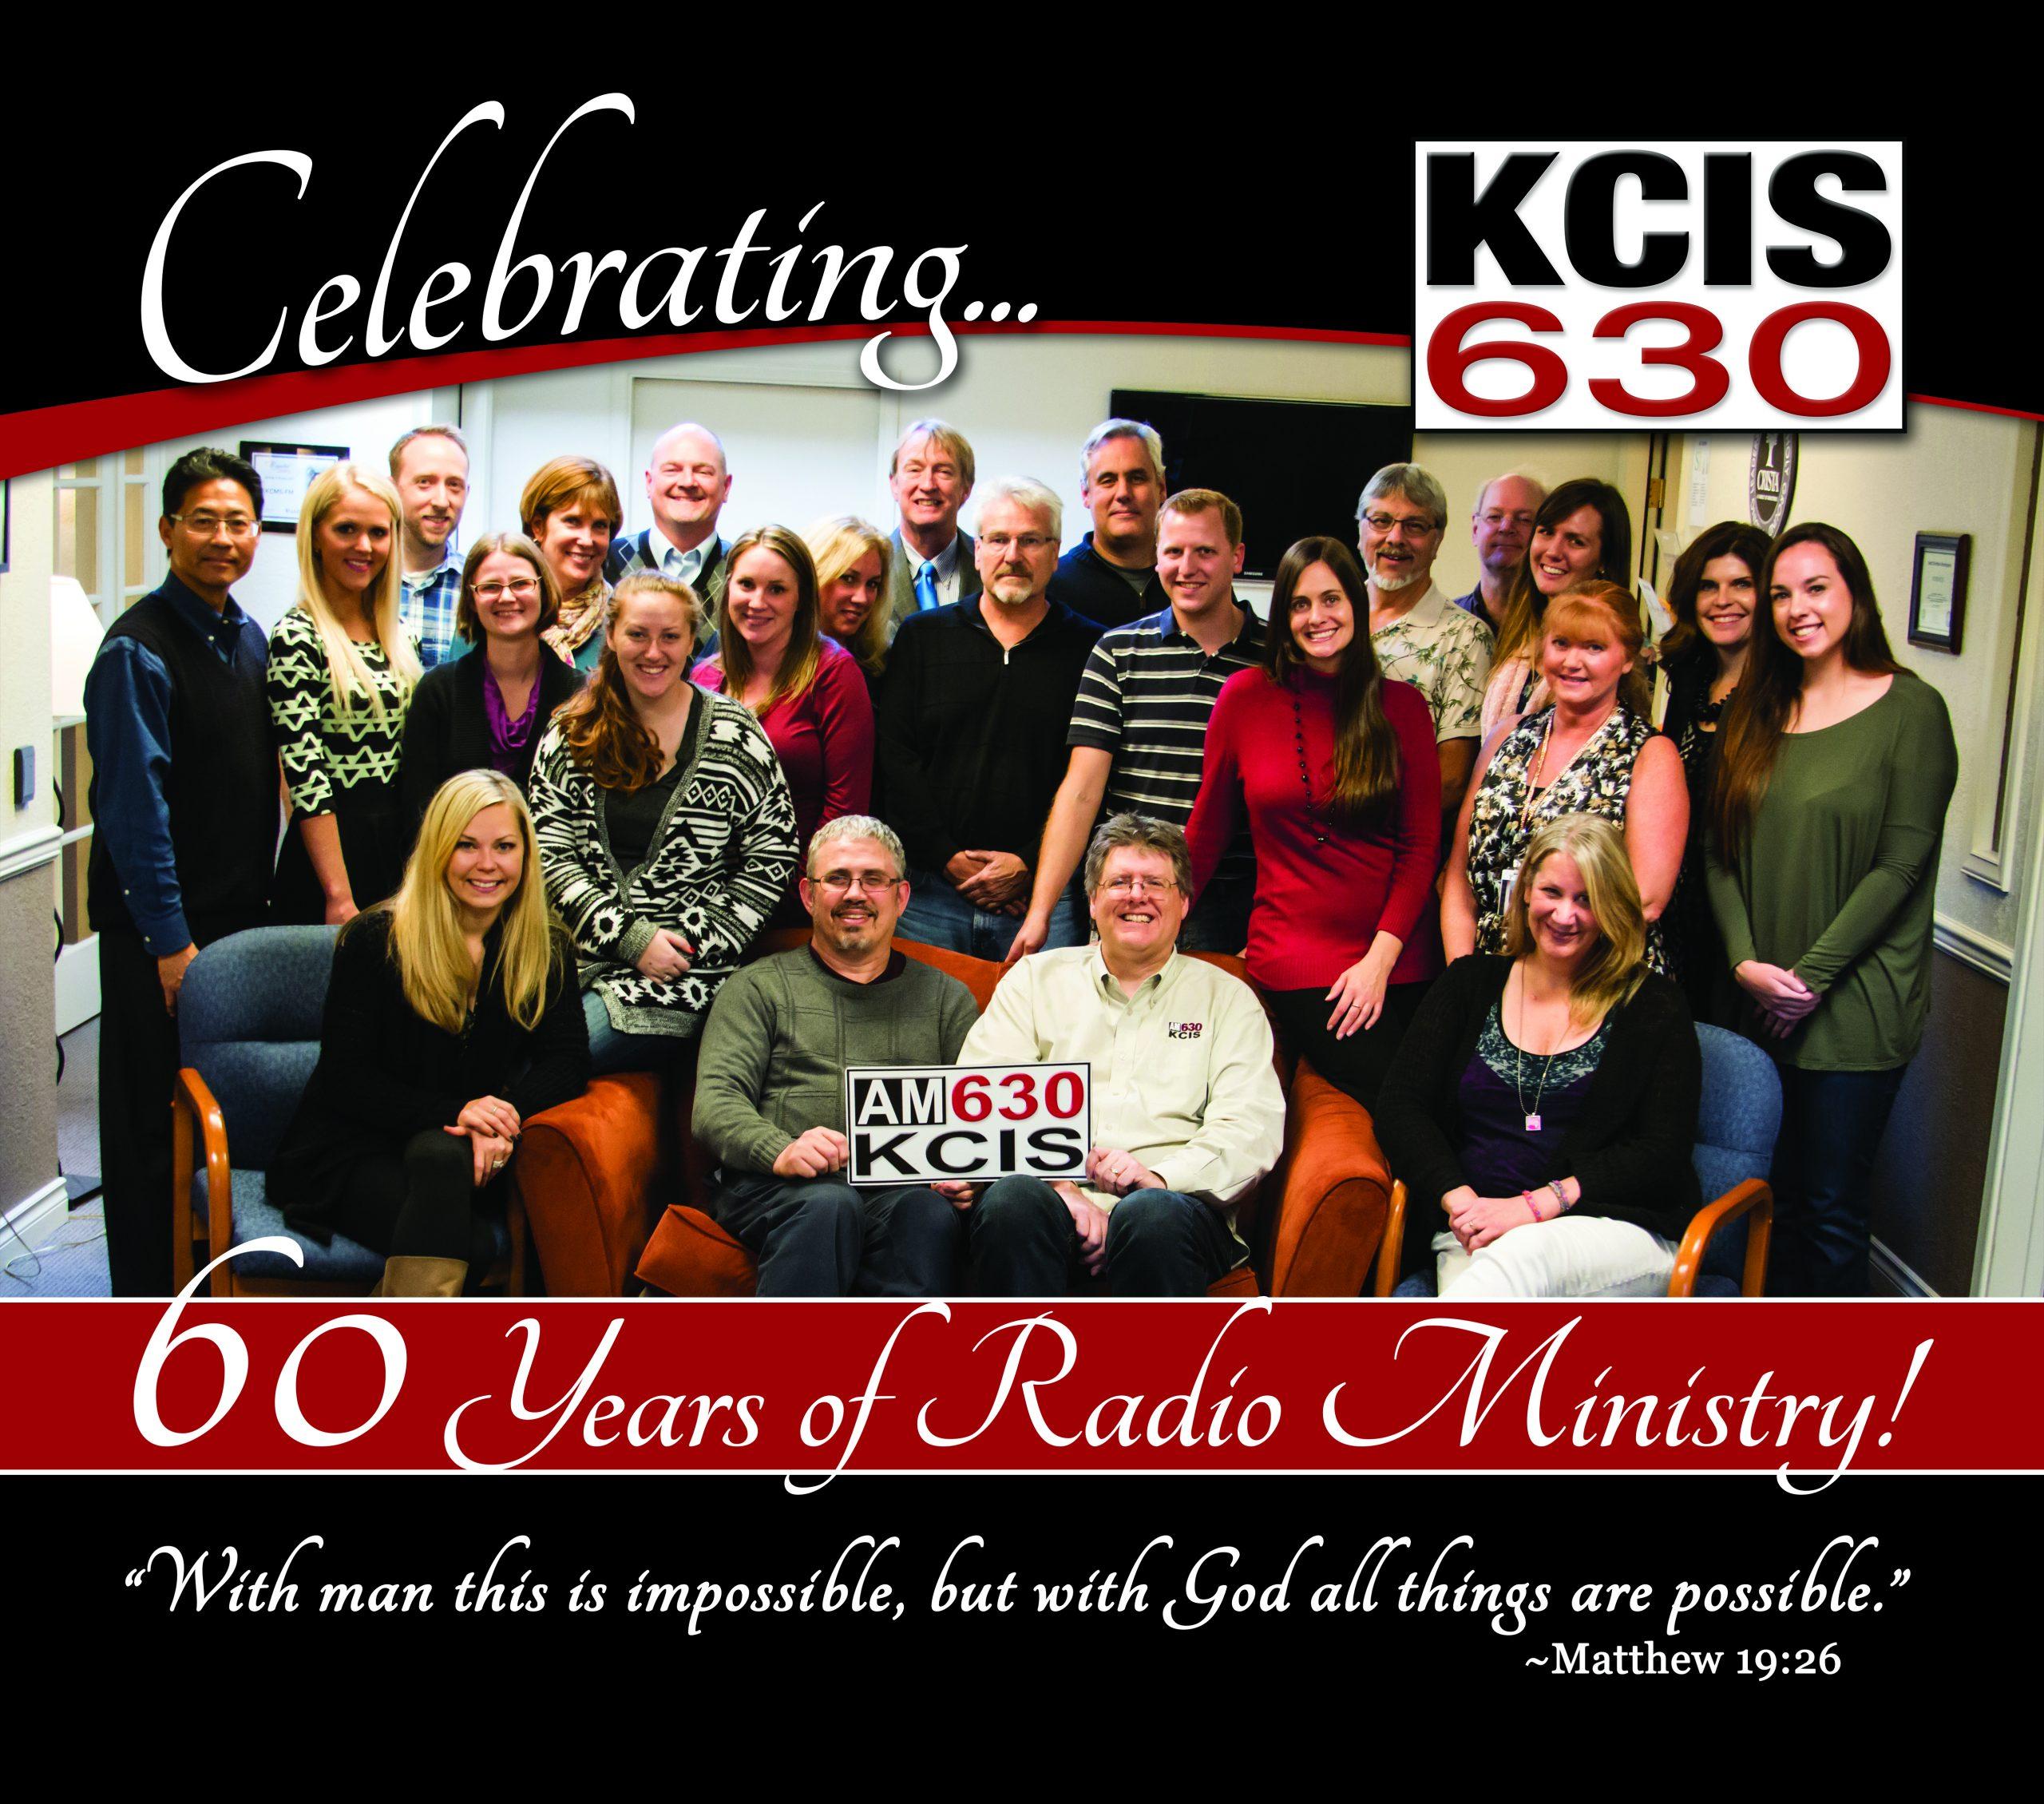 KCIS 630 Celebrates Diamond Anniversary